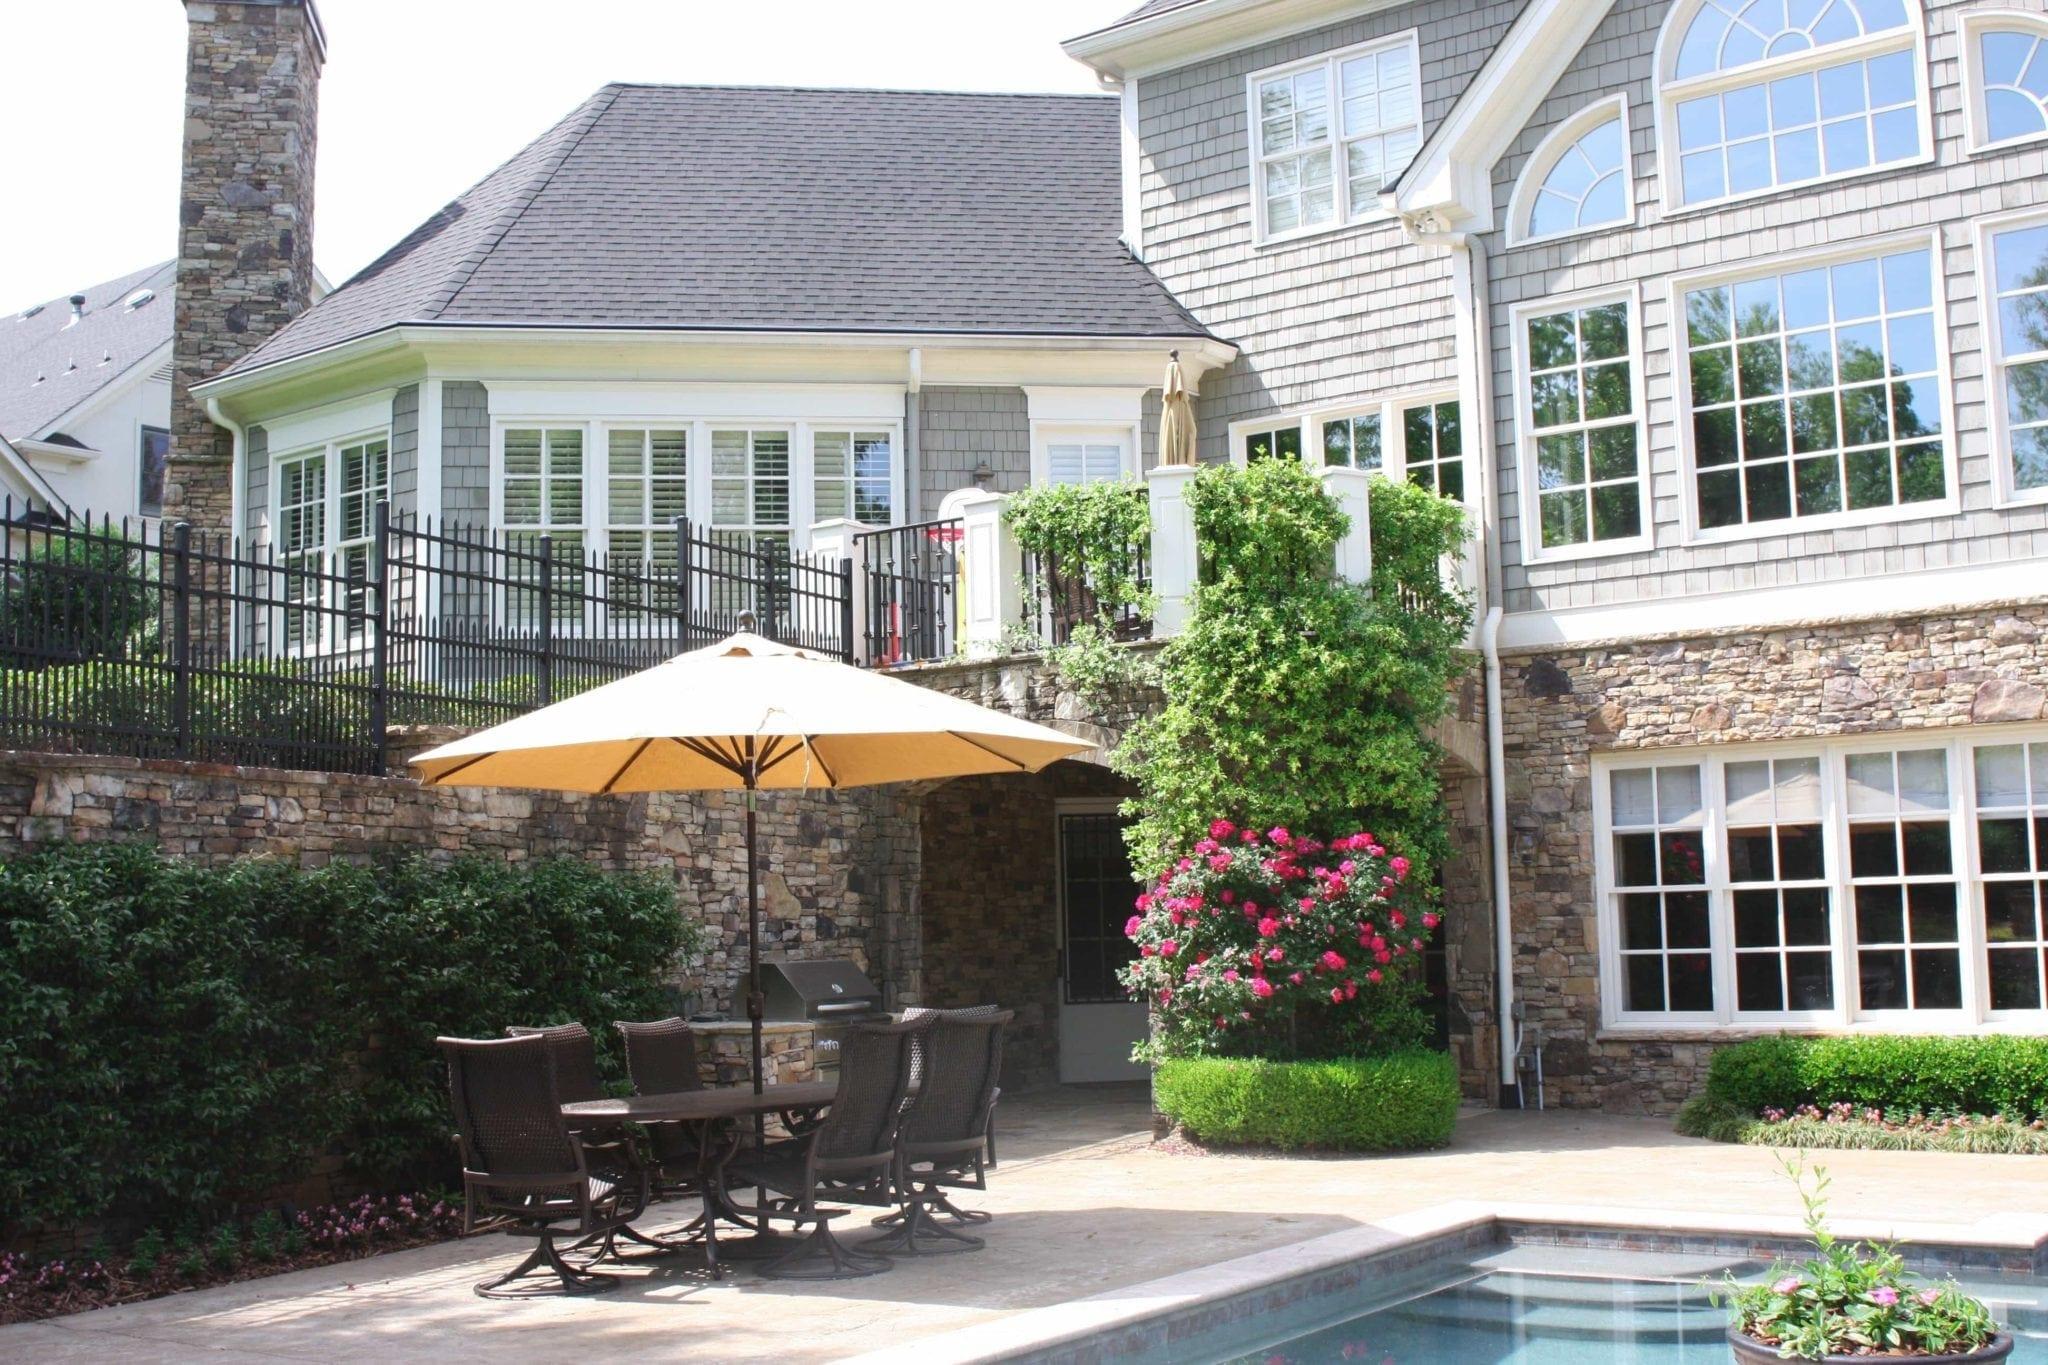 Backyard pool landscaping ideas. Jasmine vine and knockout roses.